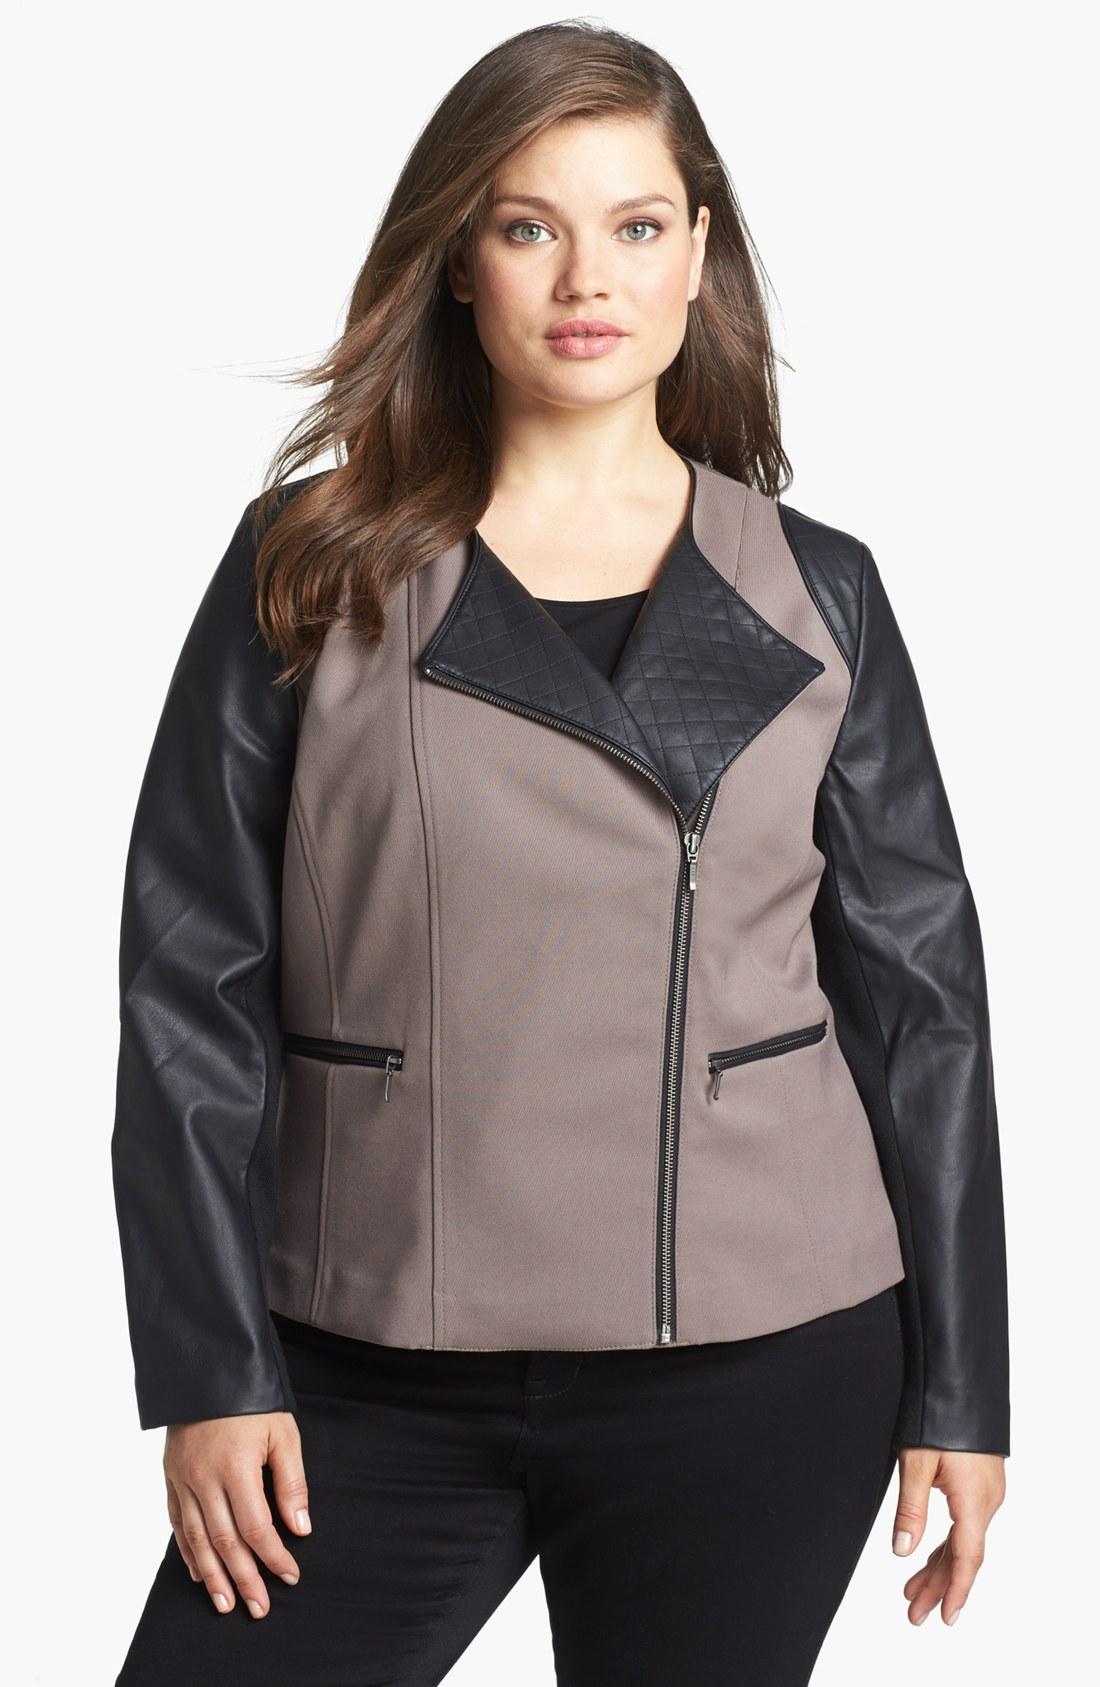 sejour faux leather twill moto jacket in black taupe. Black Bedroom Furniture Sets. Home Design Ideas